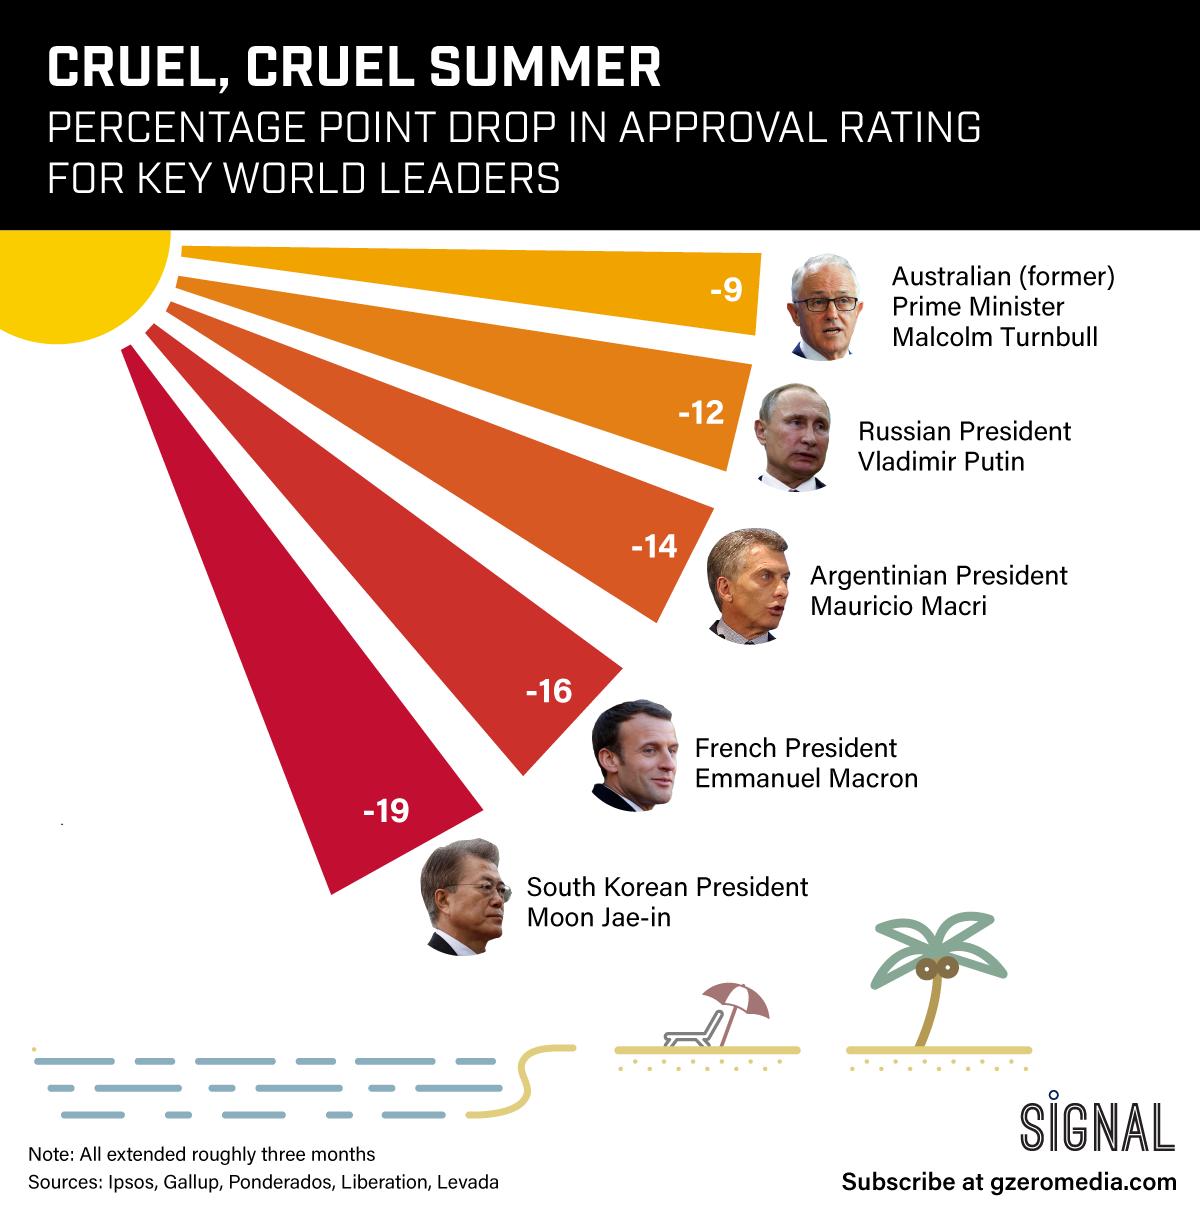 Graphic Truth: Cruel, Cruel Summer